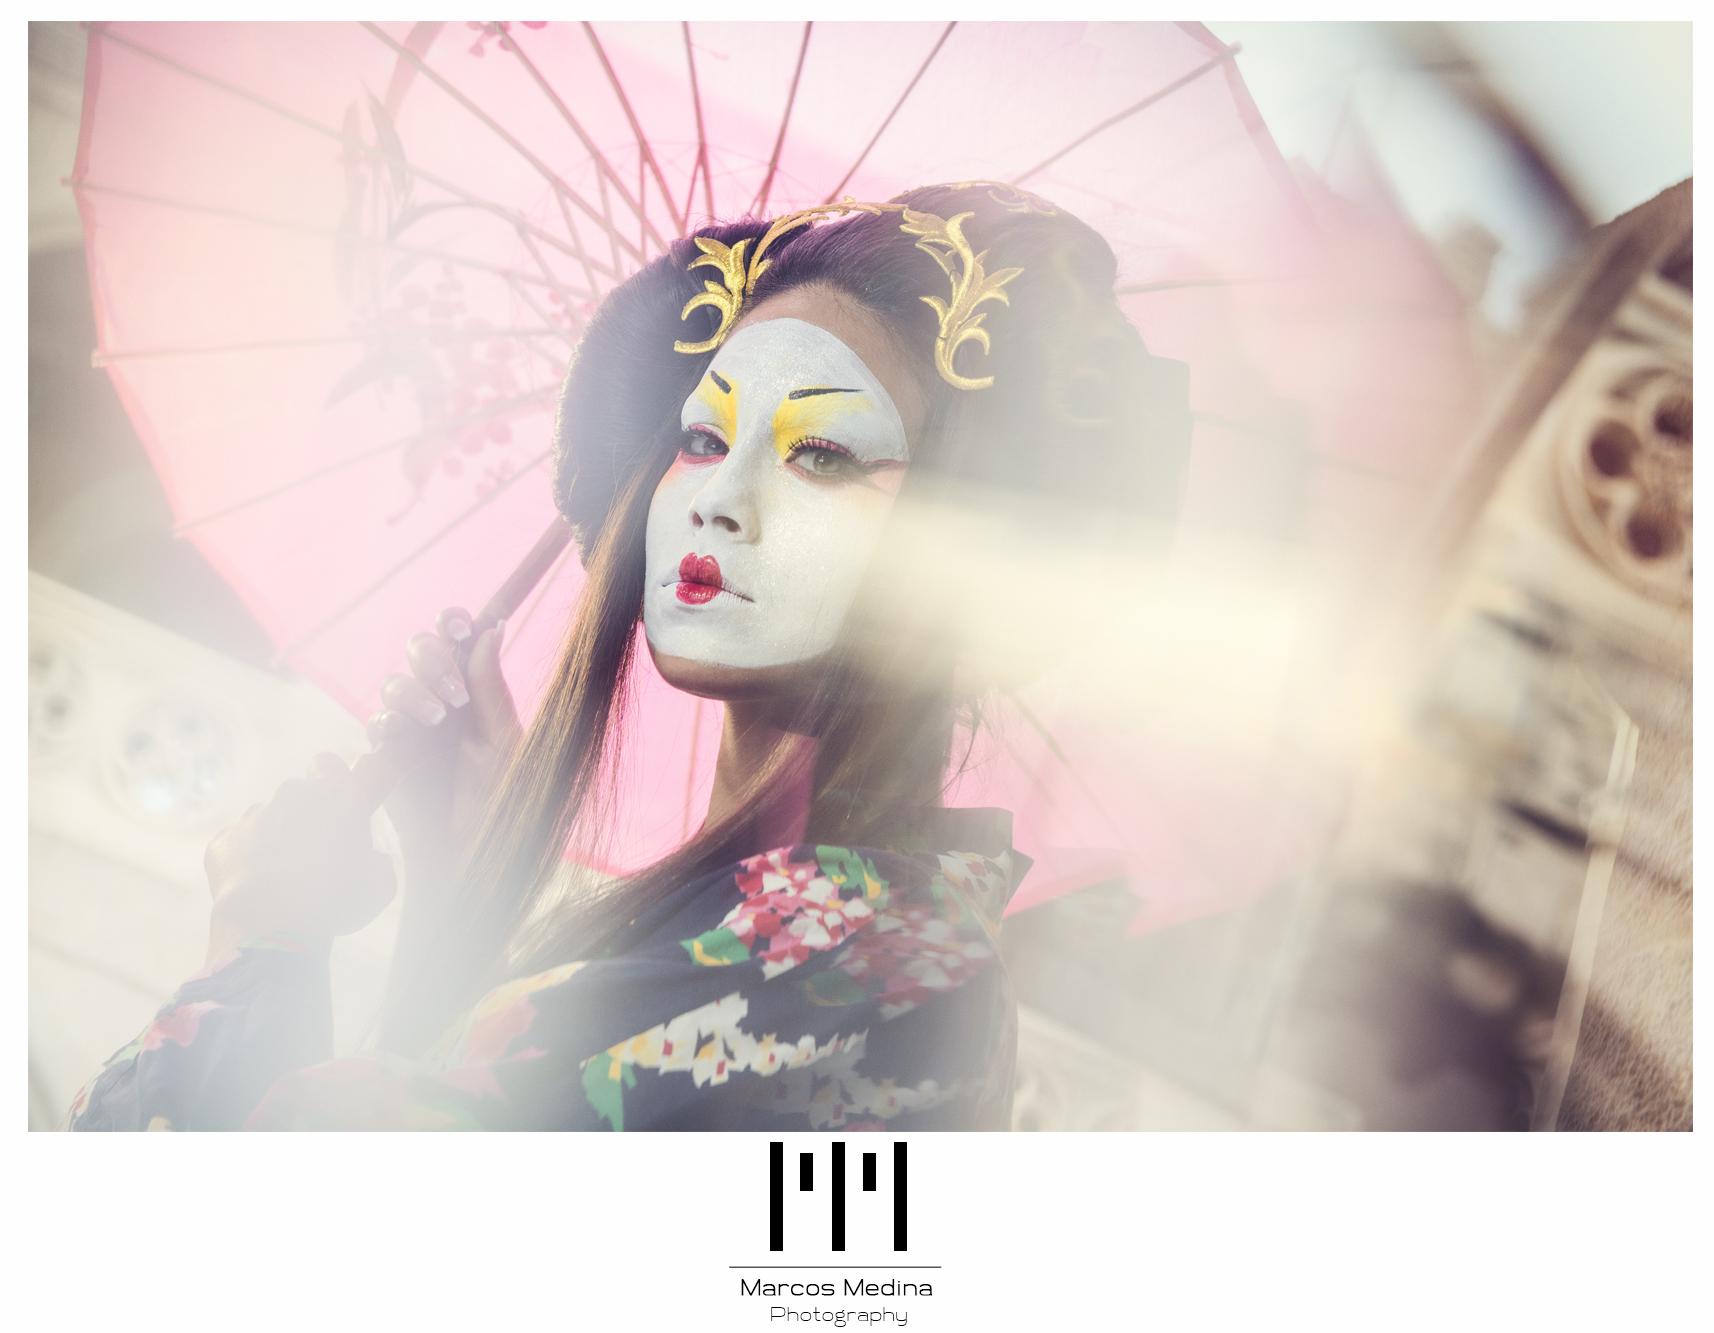 Marcos_Medina_Photography_Geisha_4